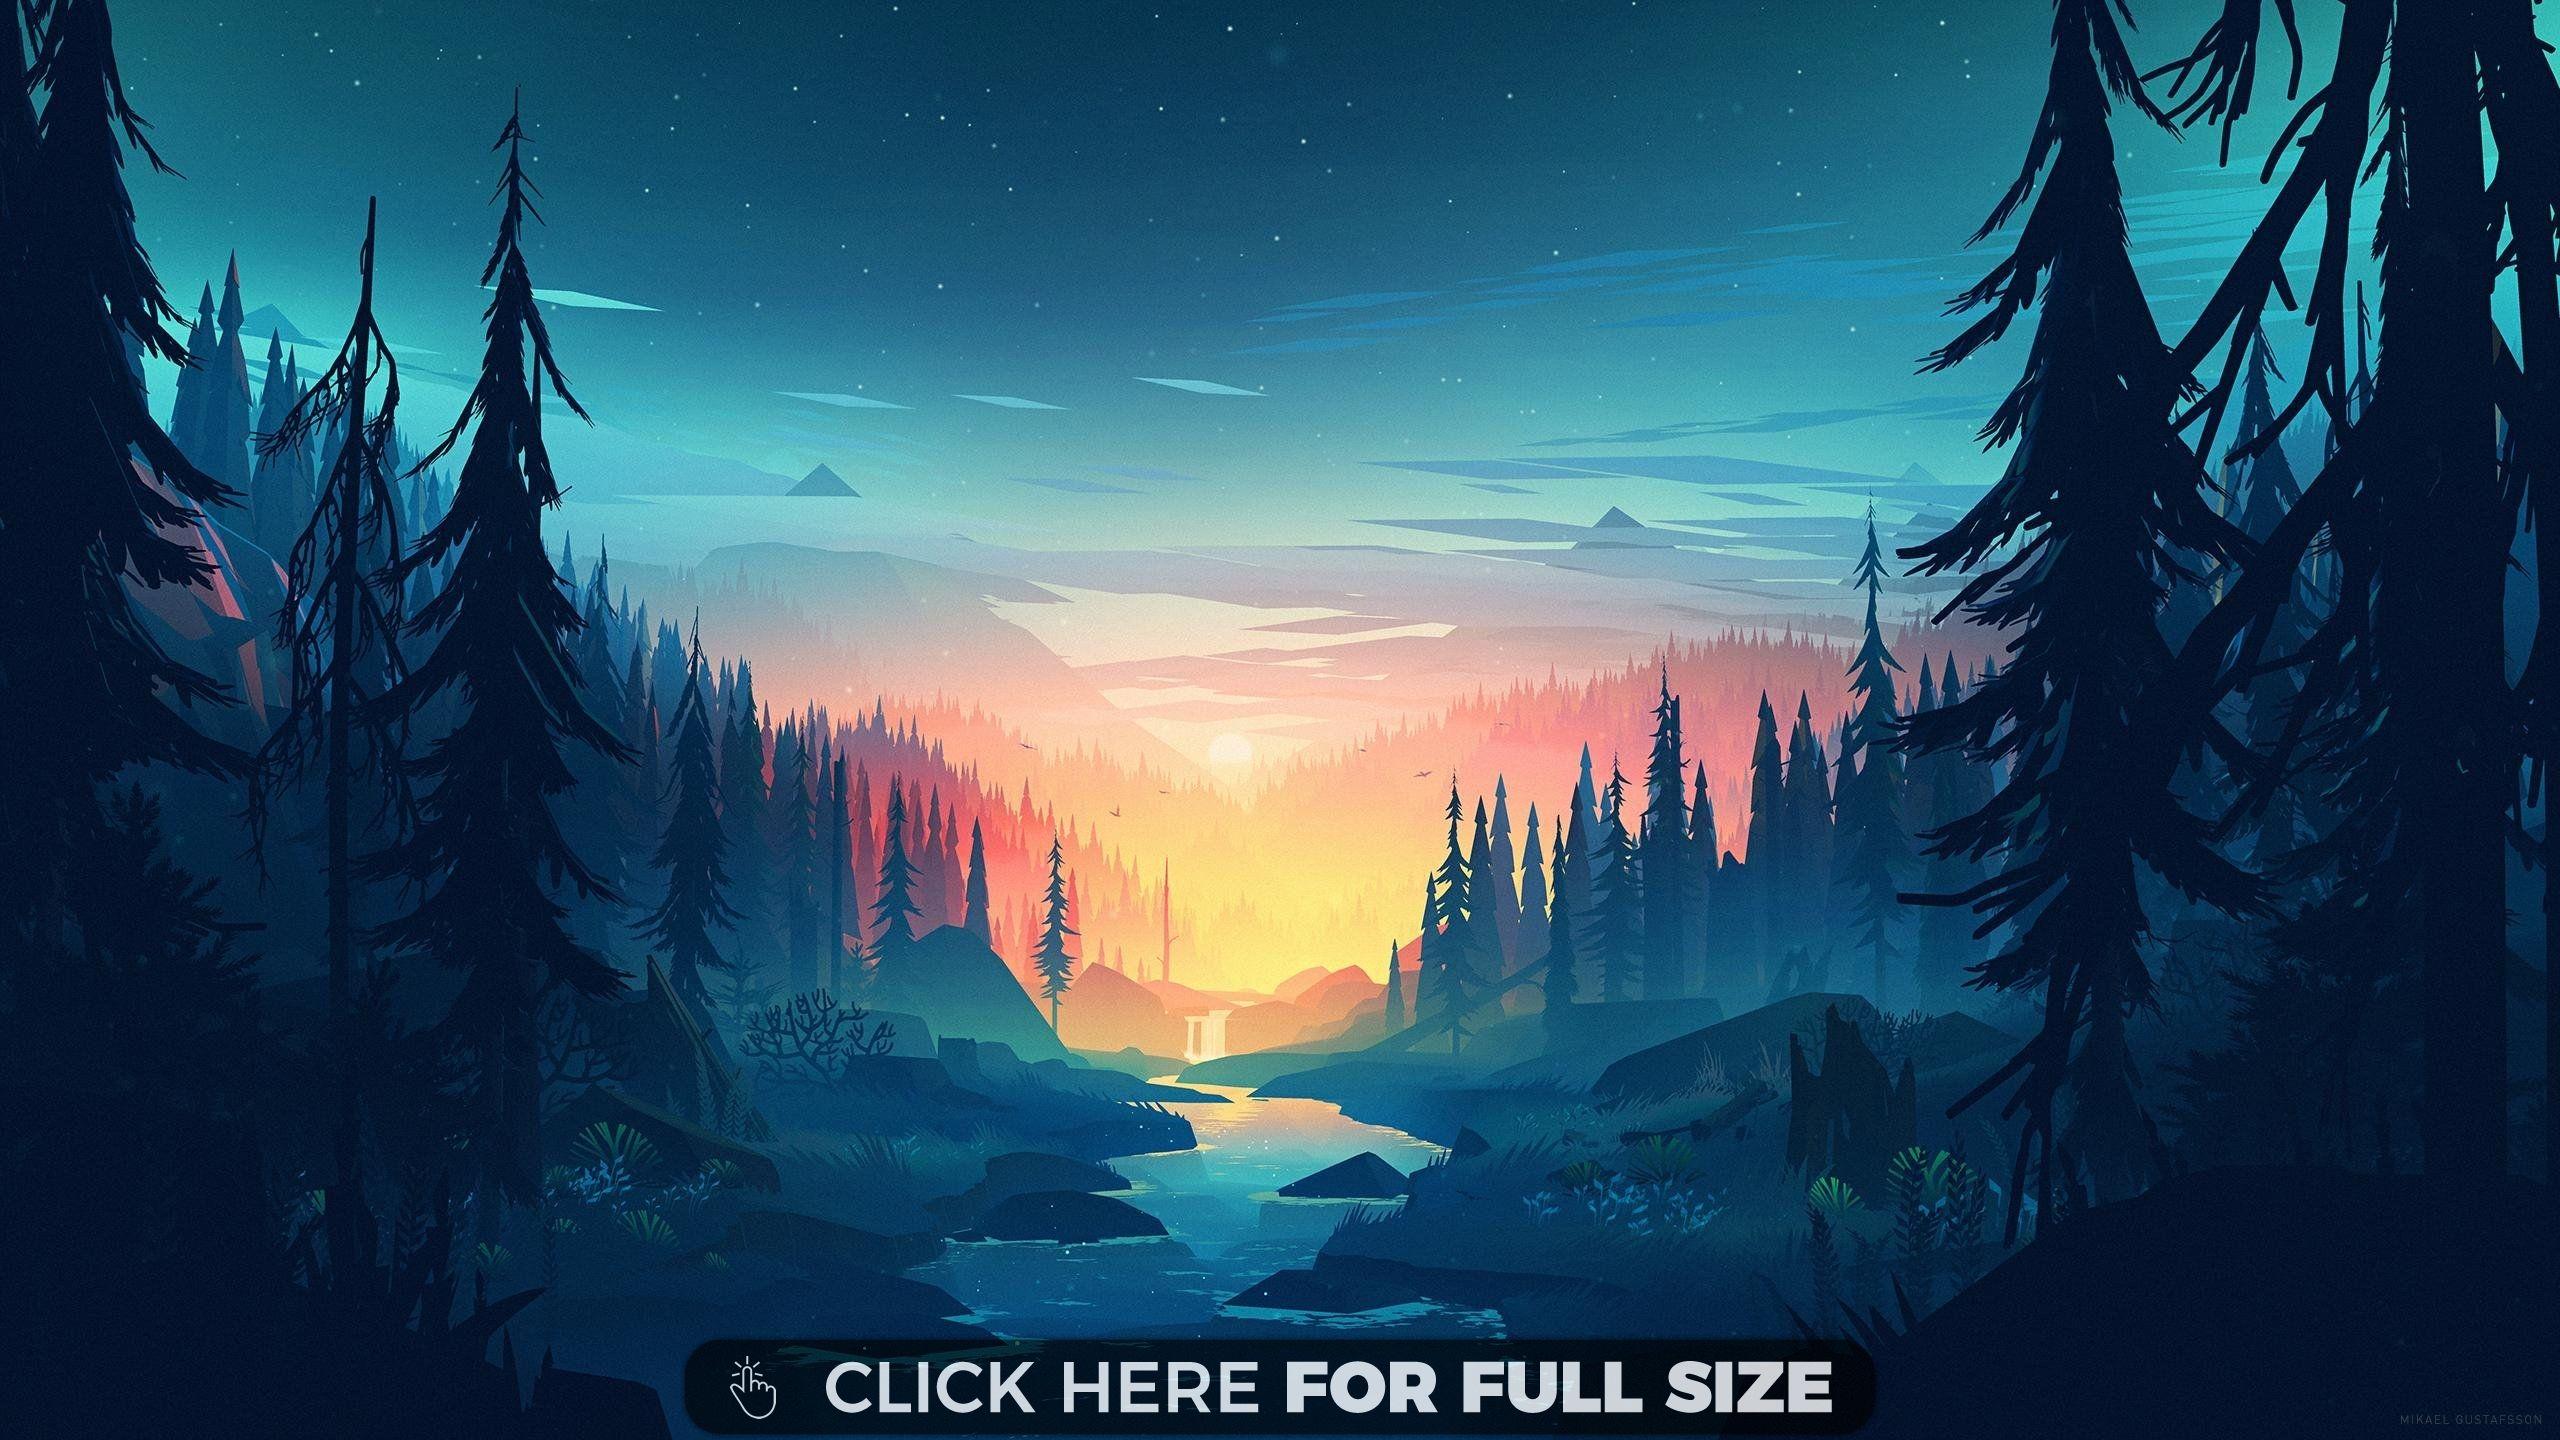 Mikael Gustafsson Forest Hd Wallpaper Scenery Wallpaper Landscape Wallpaper Desktop Wallpaper Art